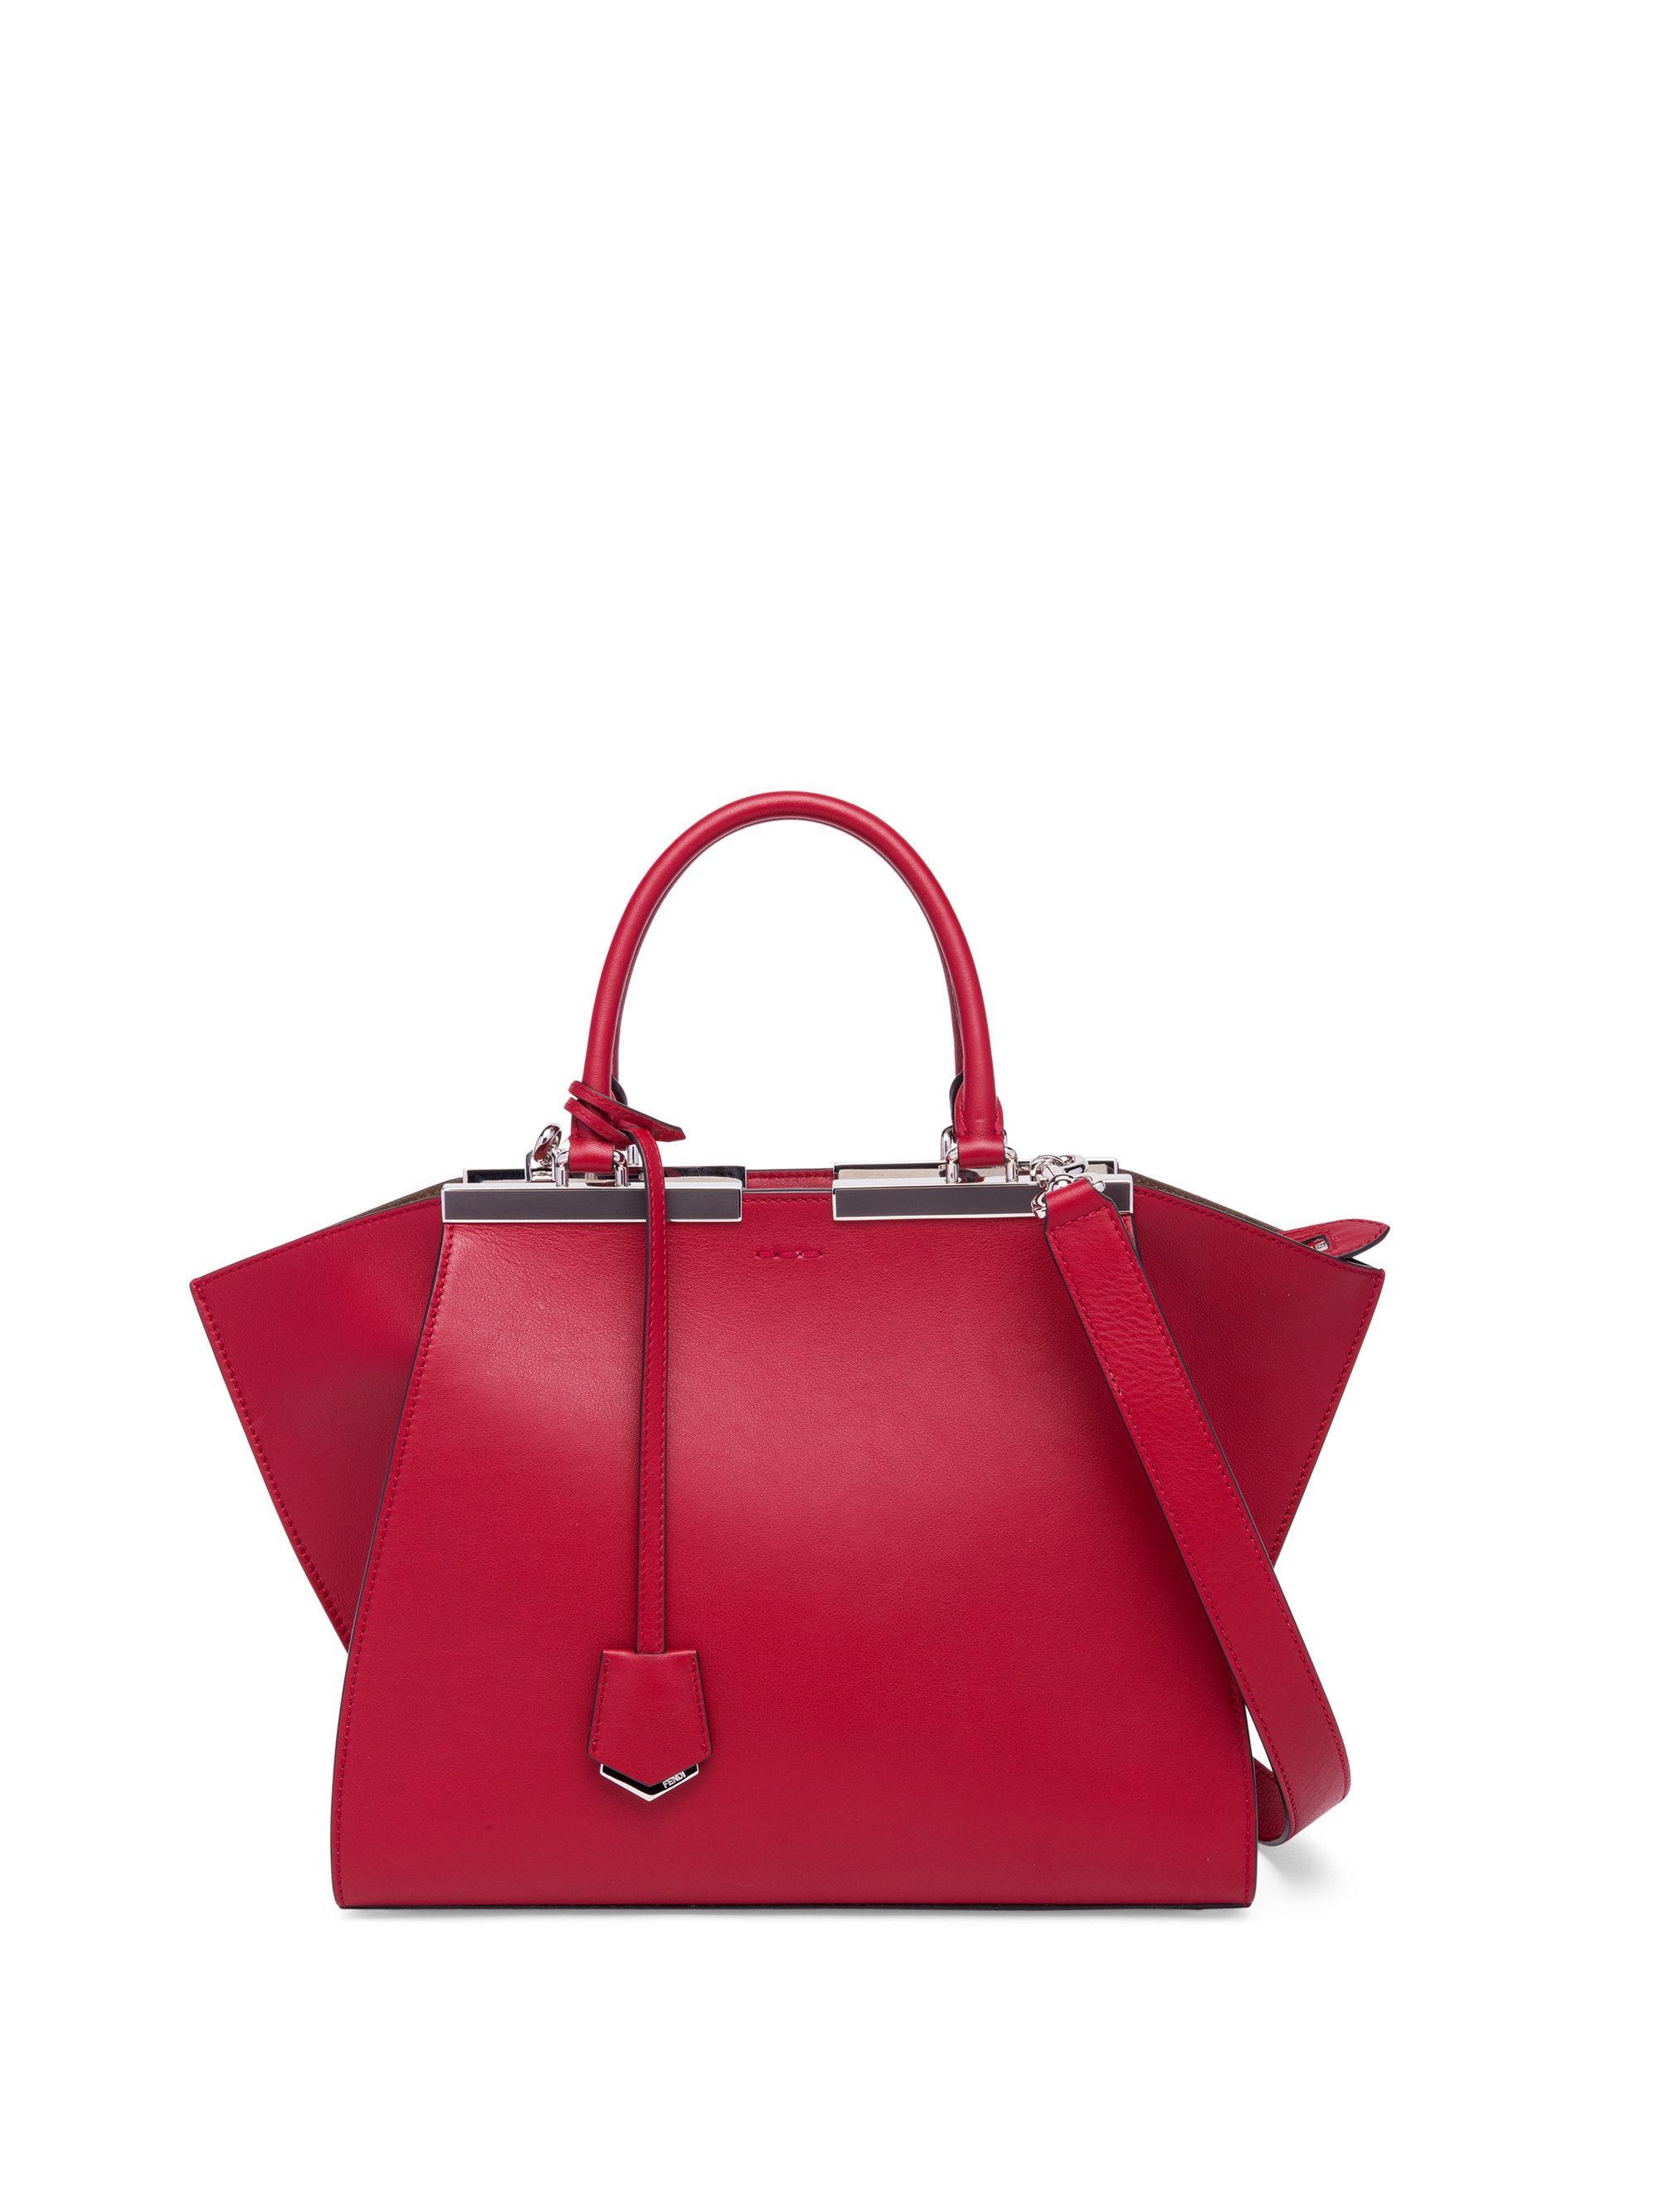 Lyst - Fendi 3jours Mini Leather Shopper in Pink 6598c28996d23